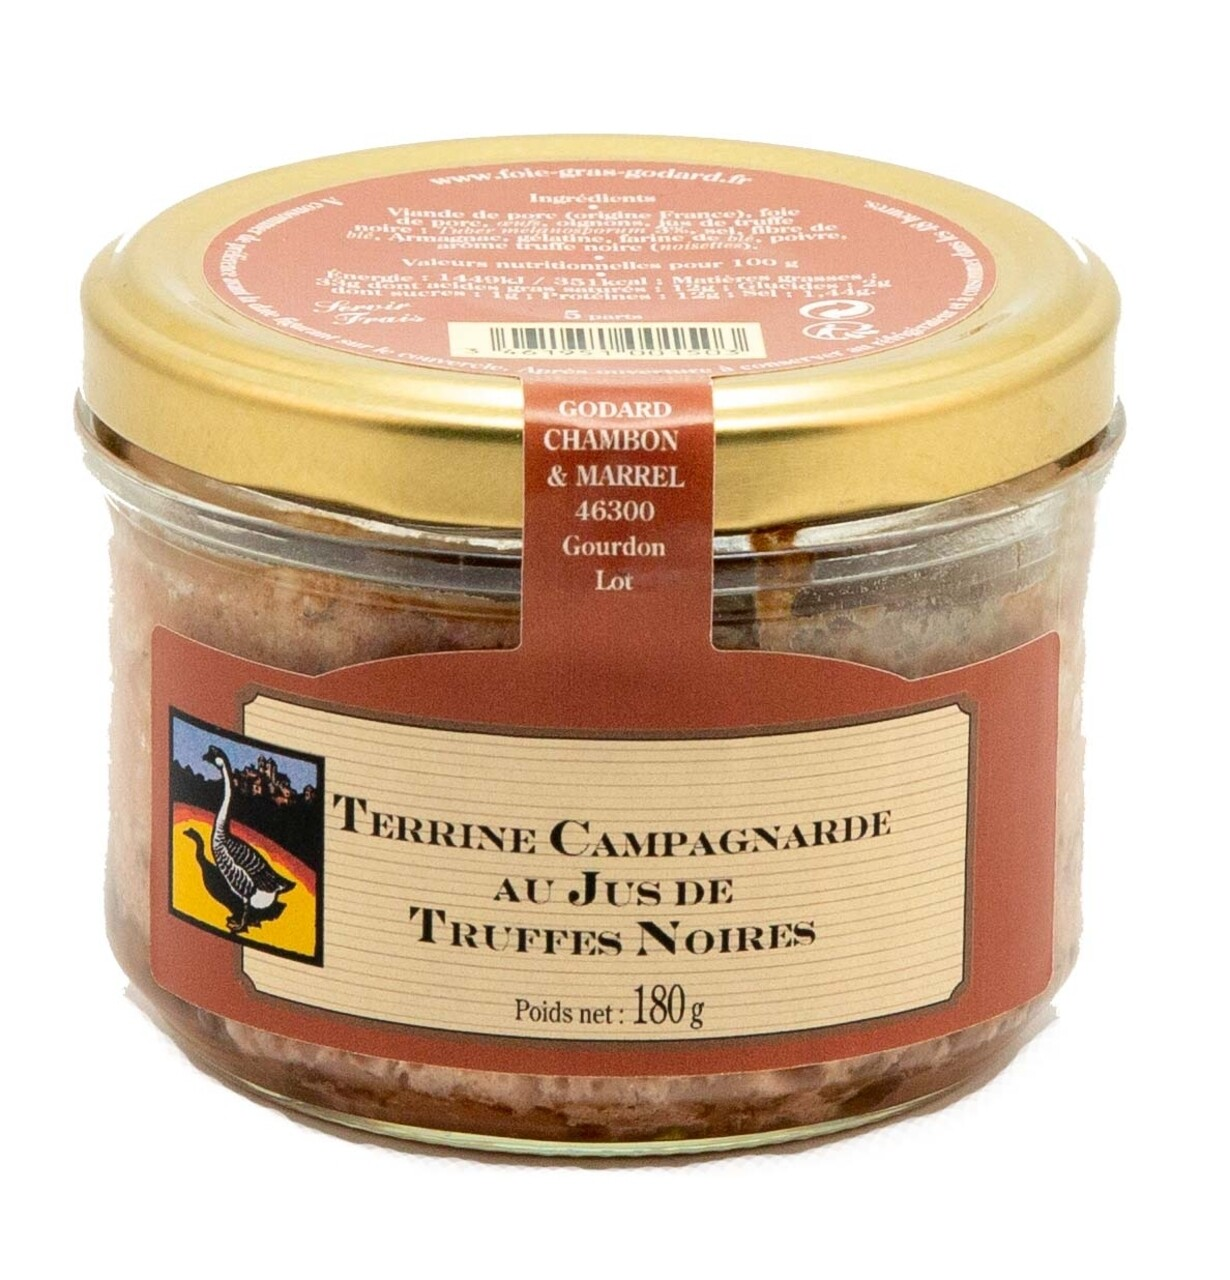 Terina taraneasca cu suc de trufe negre, Godard Chambon & Marell, 180g